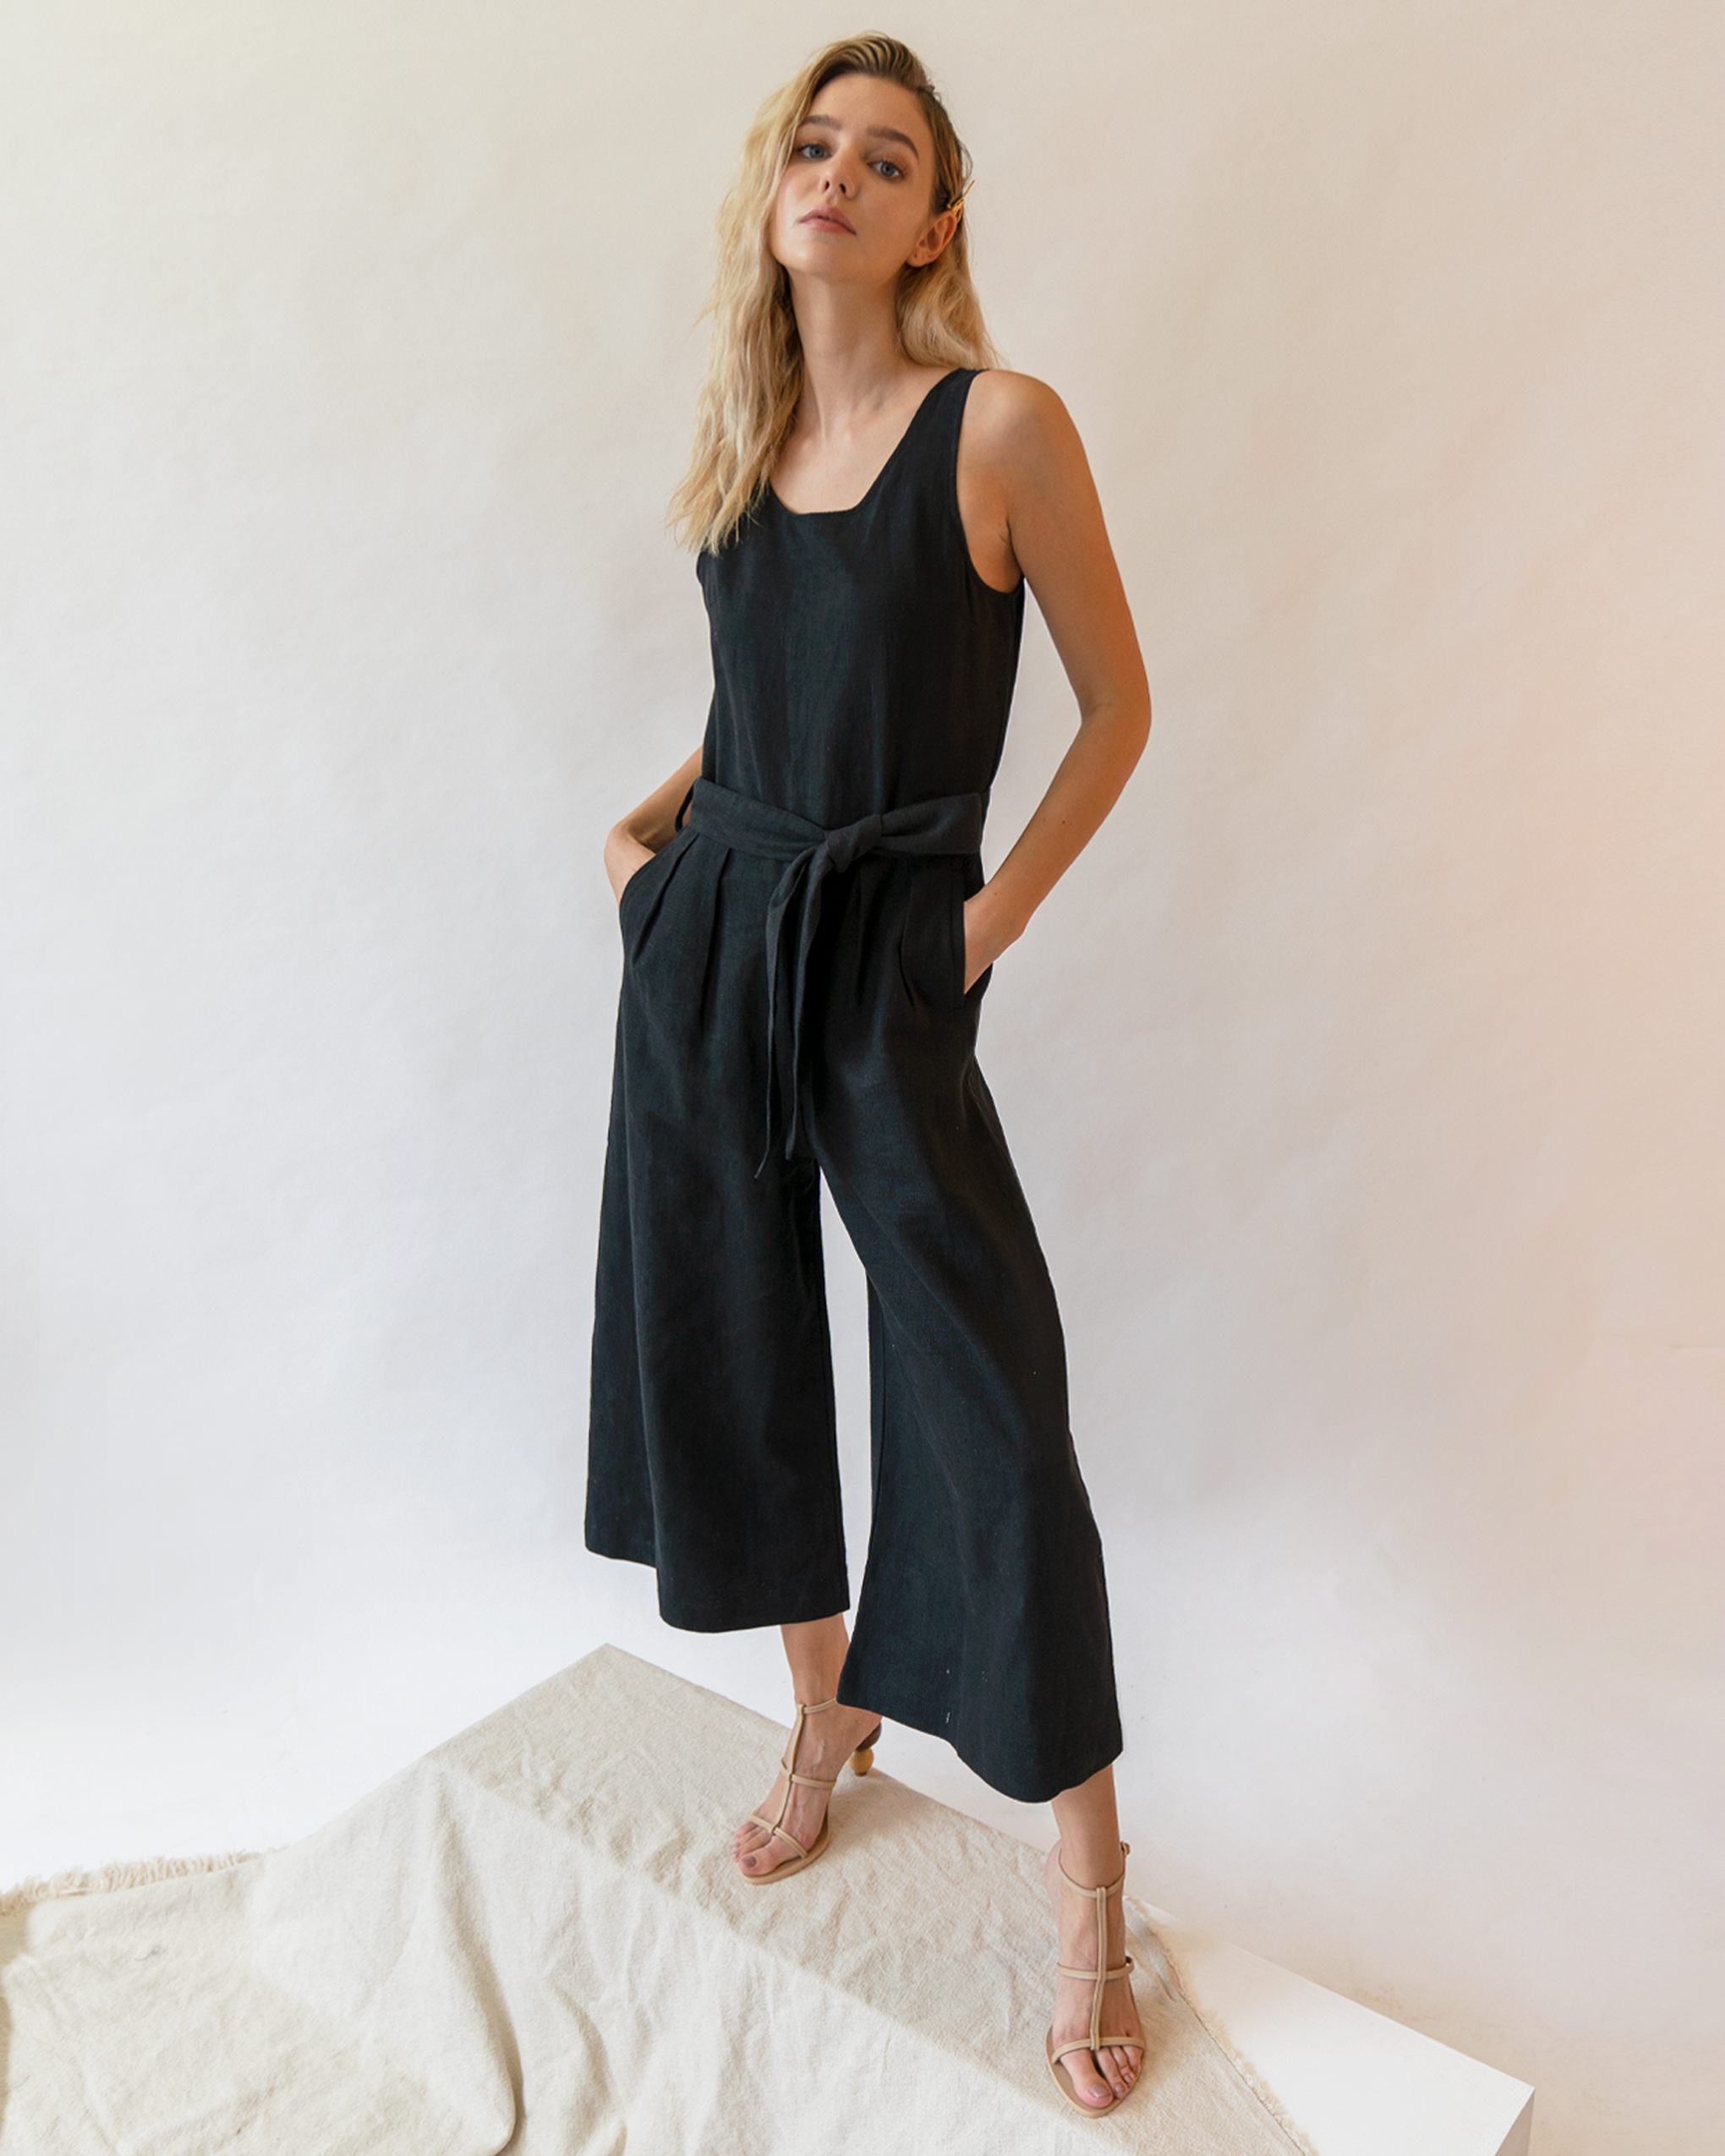 A woman is wearing a black sleeveless scoop back linen jumpsuit.